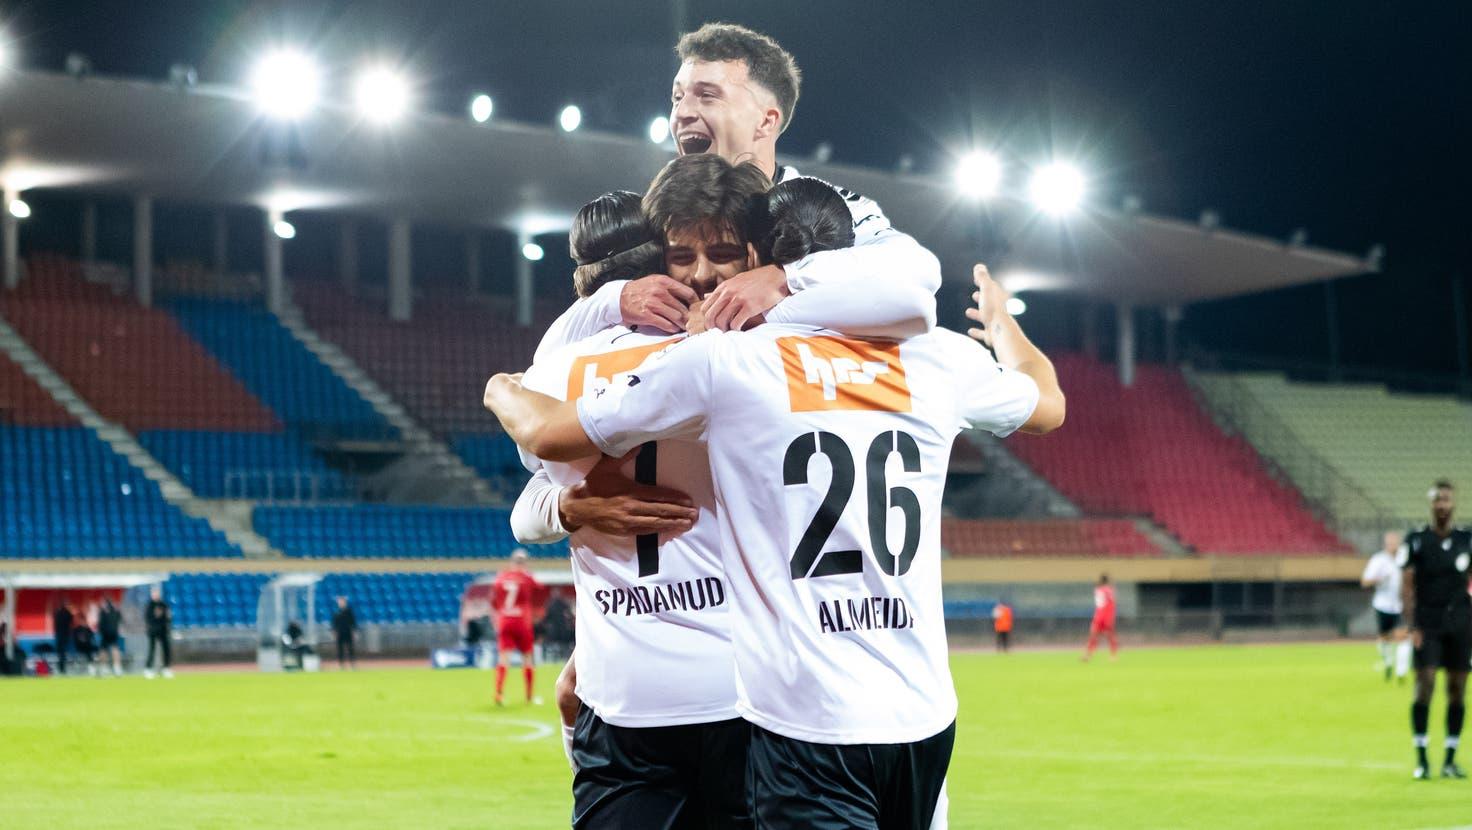 Jetzt live: Gelingt dem FC Aarau die Cup-Überraschung gegen Lausanne?